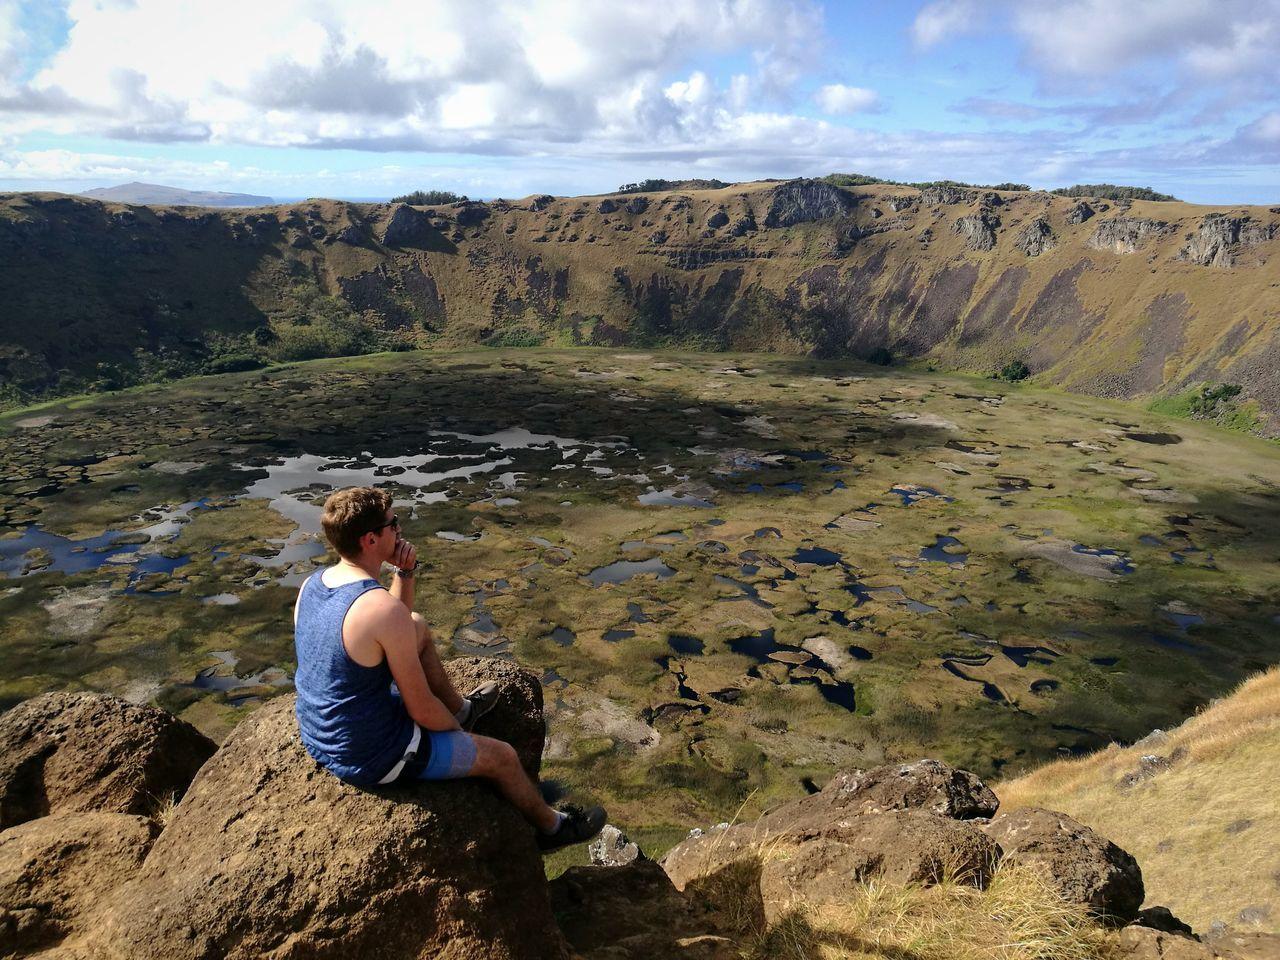 High Angle View Of Hiker Looking At View While Sitting At Crater Lake Of Rano Kau